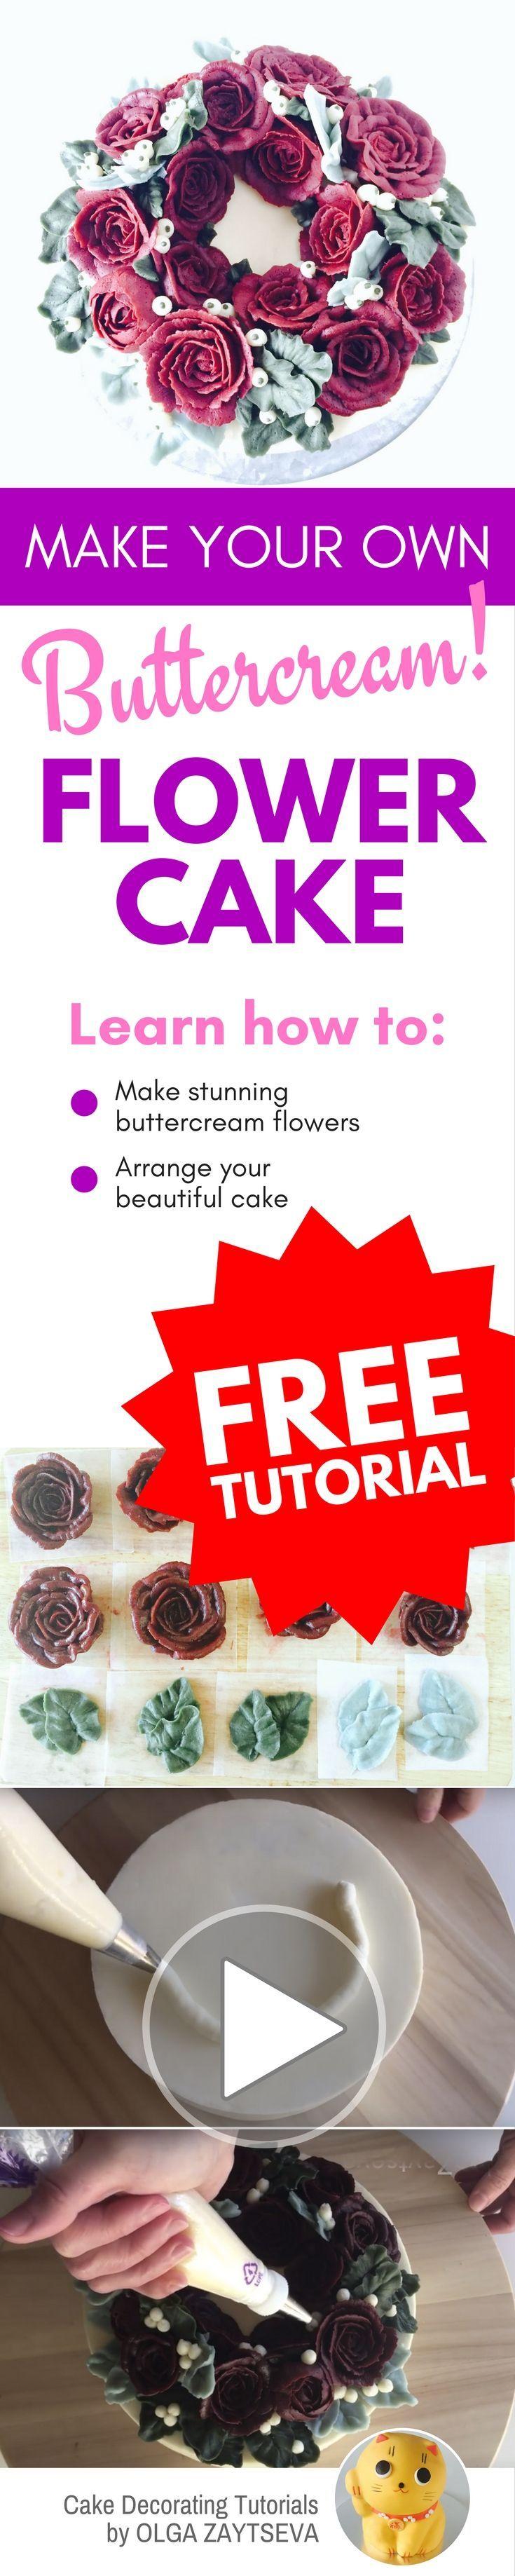 Wie Buttercreme Red Roses Flower Wreath Kuchen machen - Kuchen dekorieren Tutorial ... -